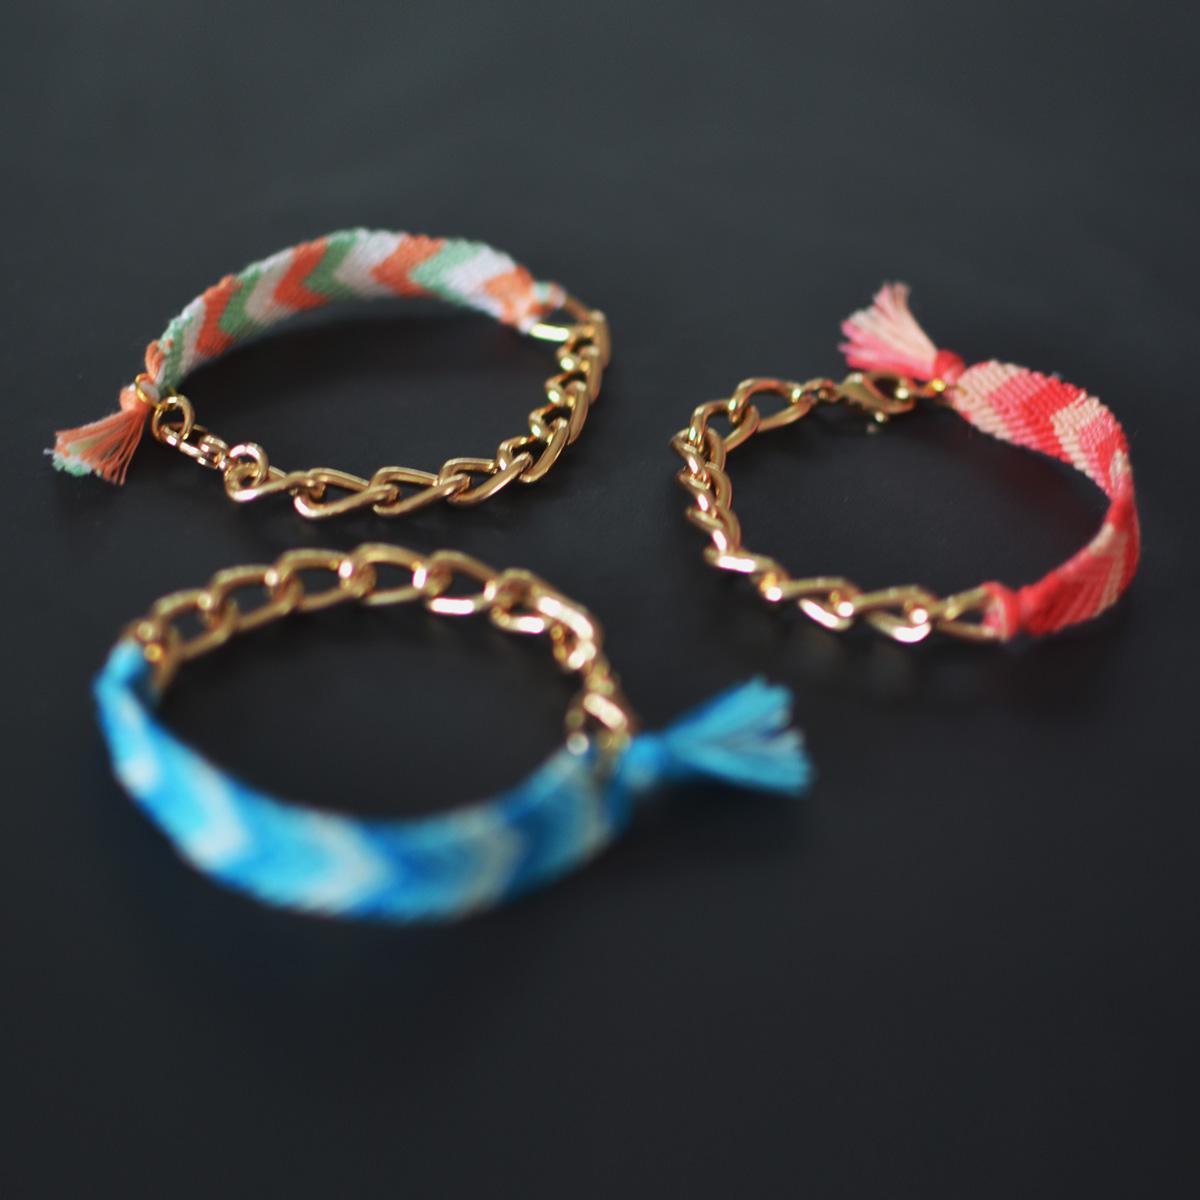 Chevron bracelet - Dsc_0162